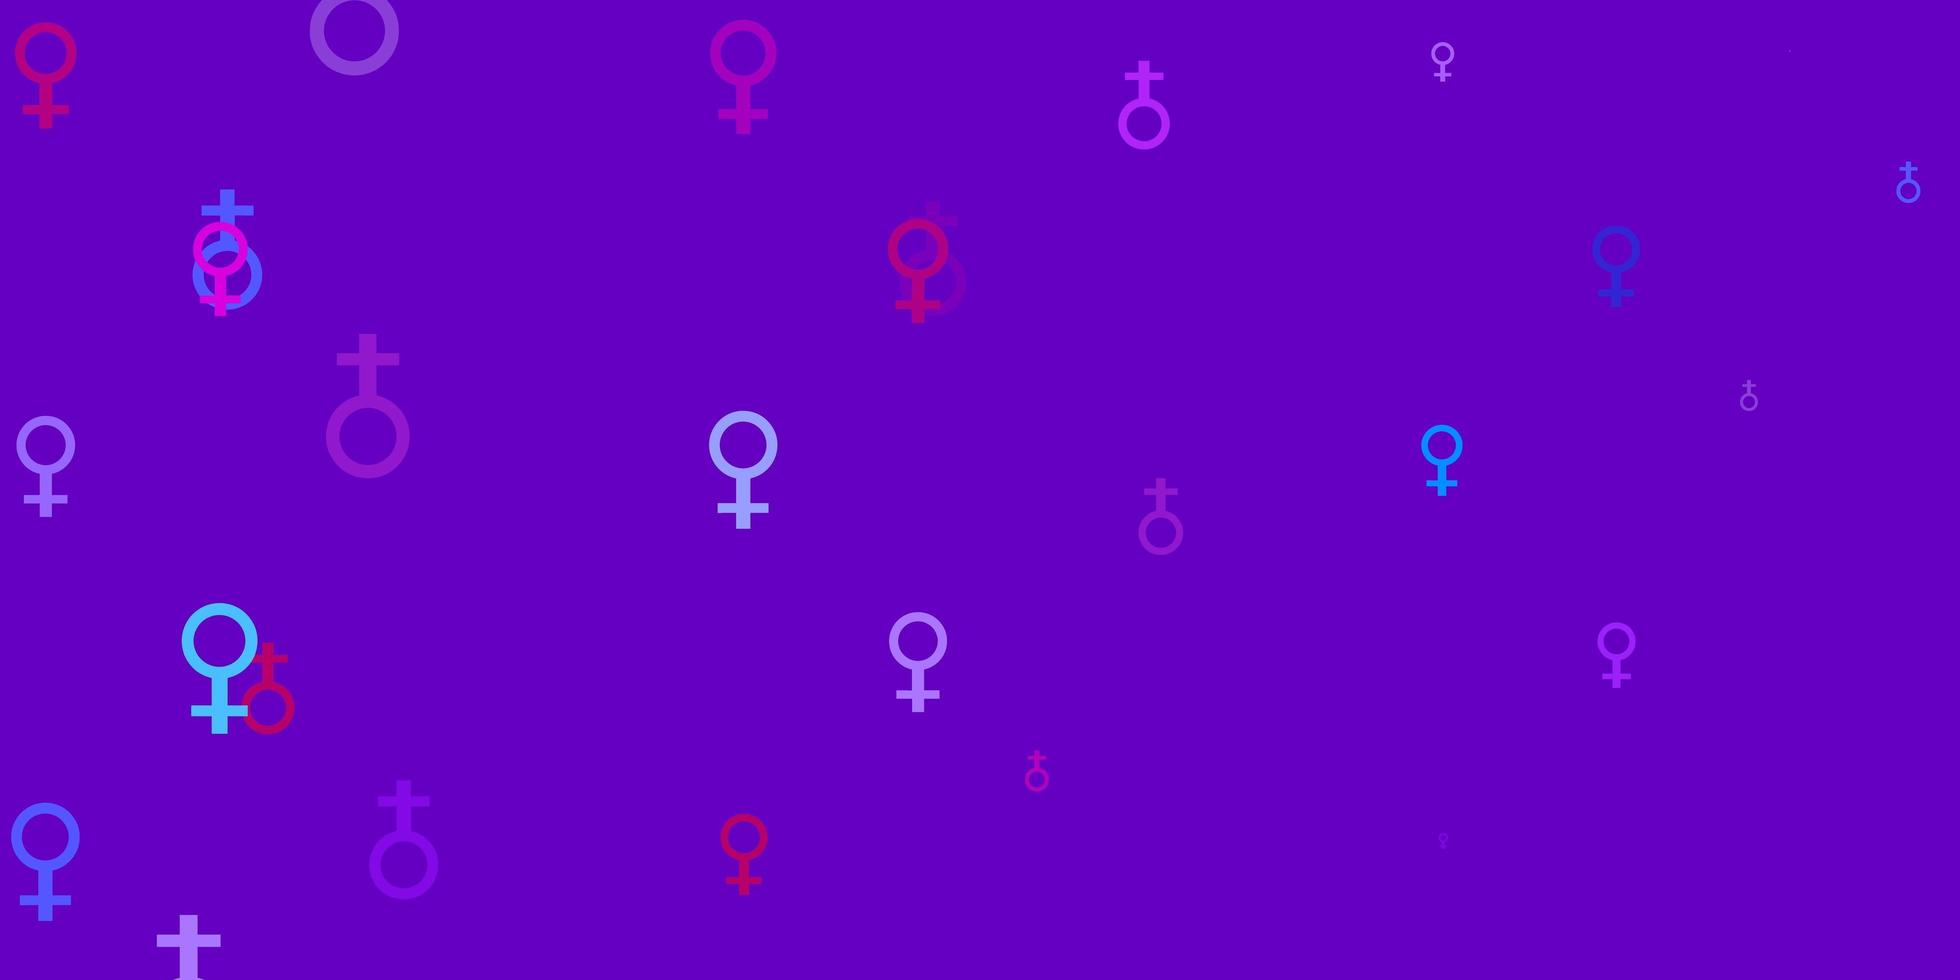 telón de fondo púrpura con símbolos de poder de la mujer. vector